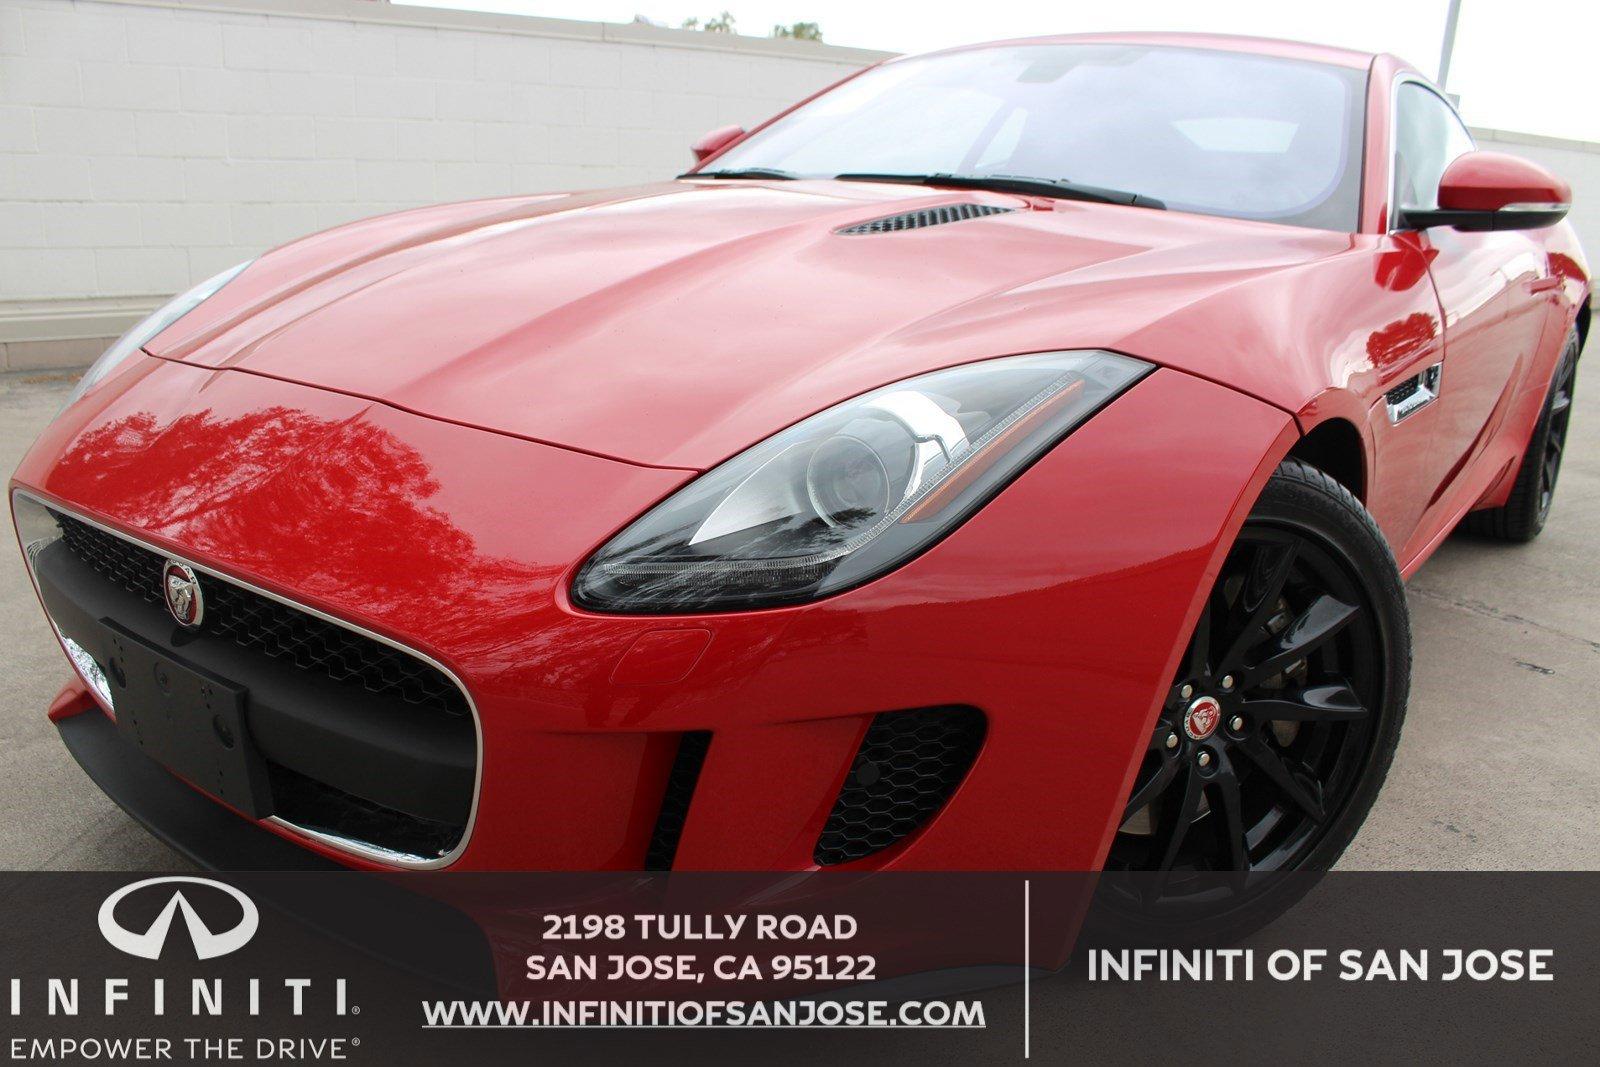 2017 Jaguar F-TYPE Coupe image